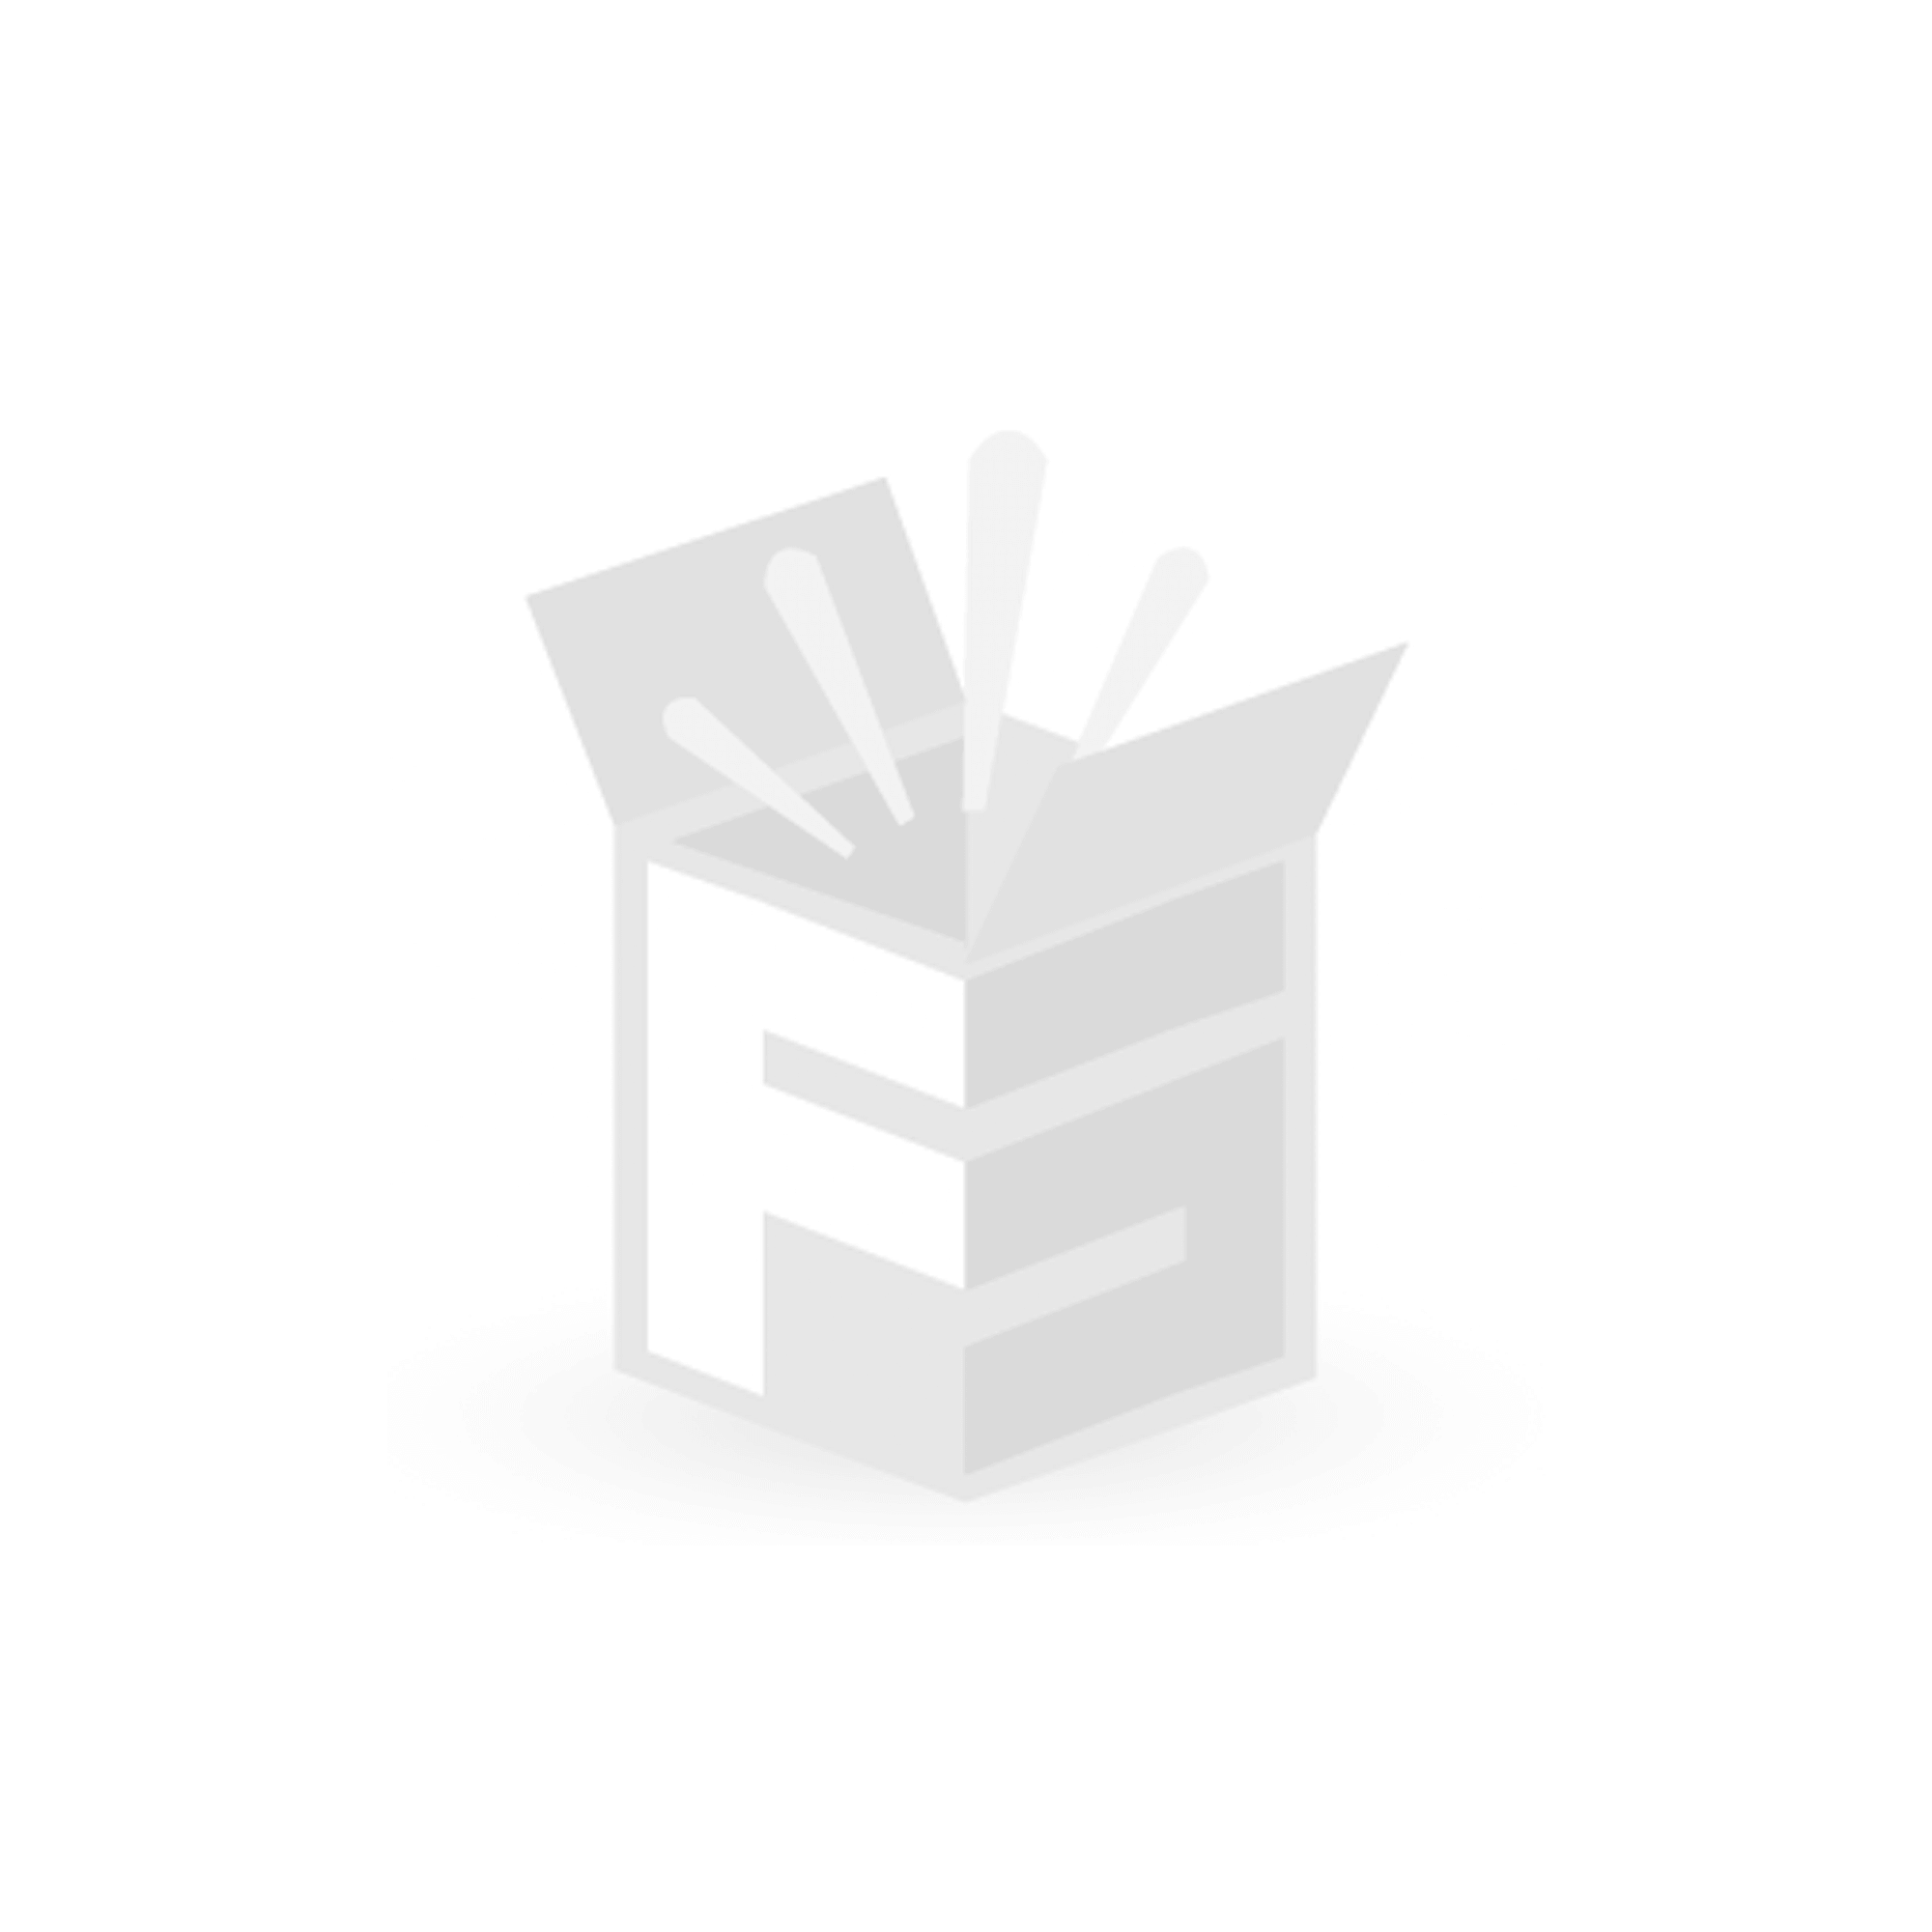 FS-STAR Papierbeutel